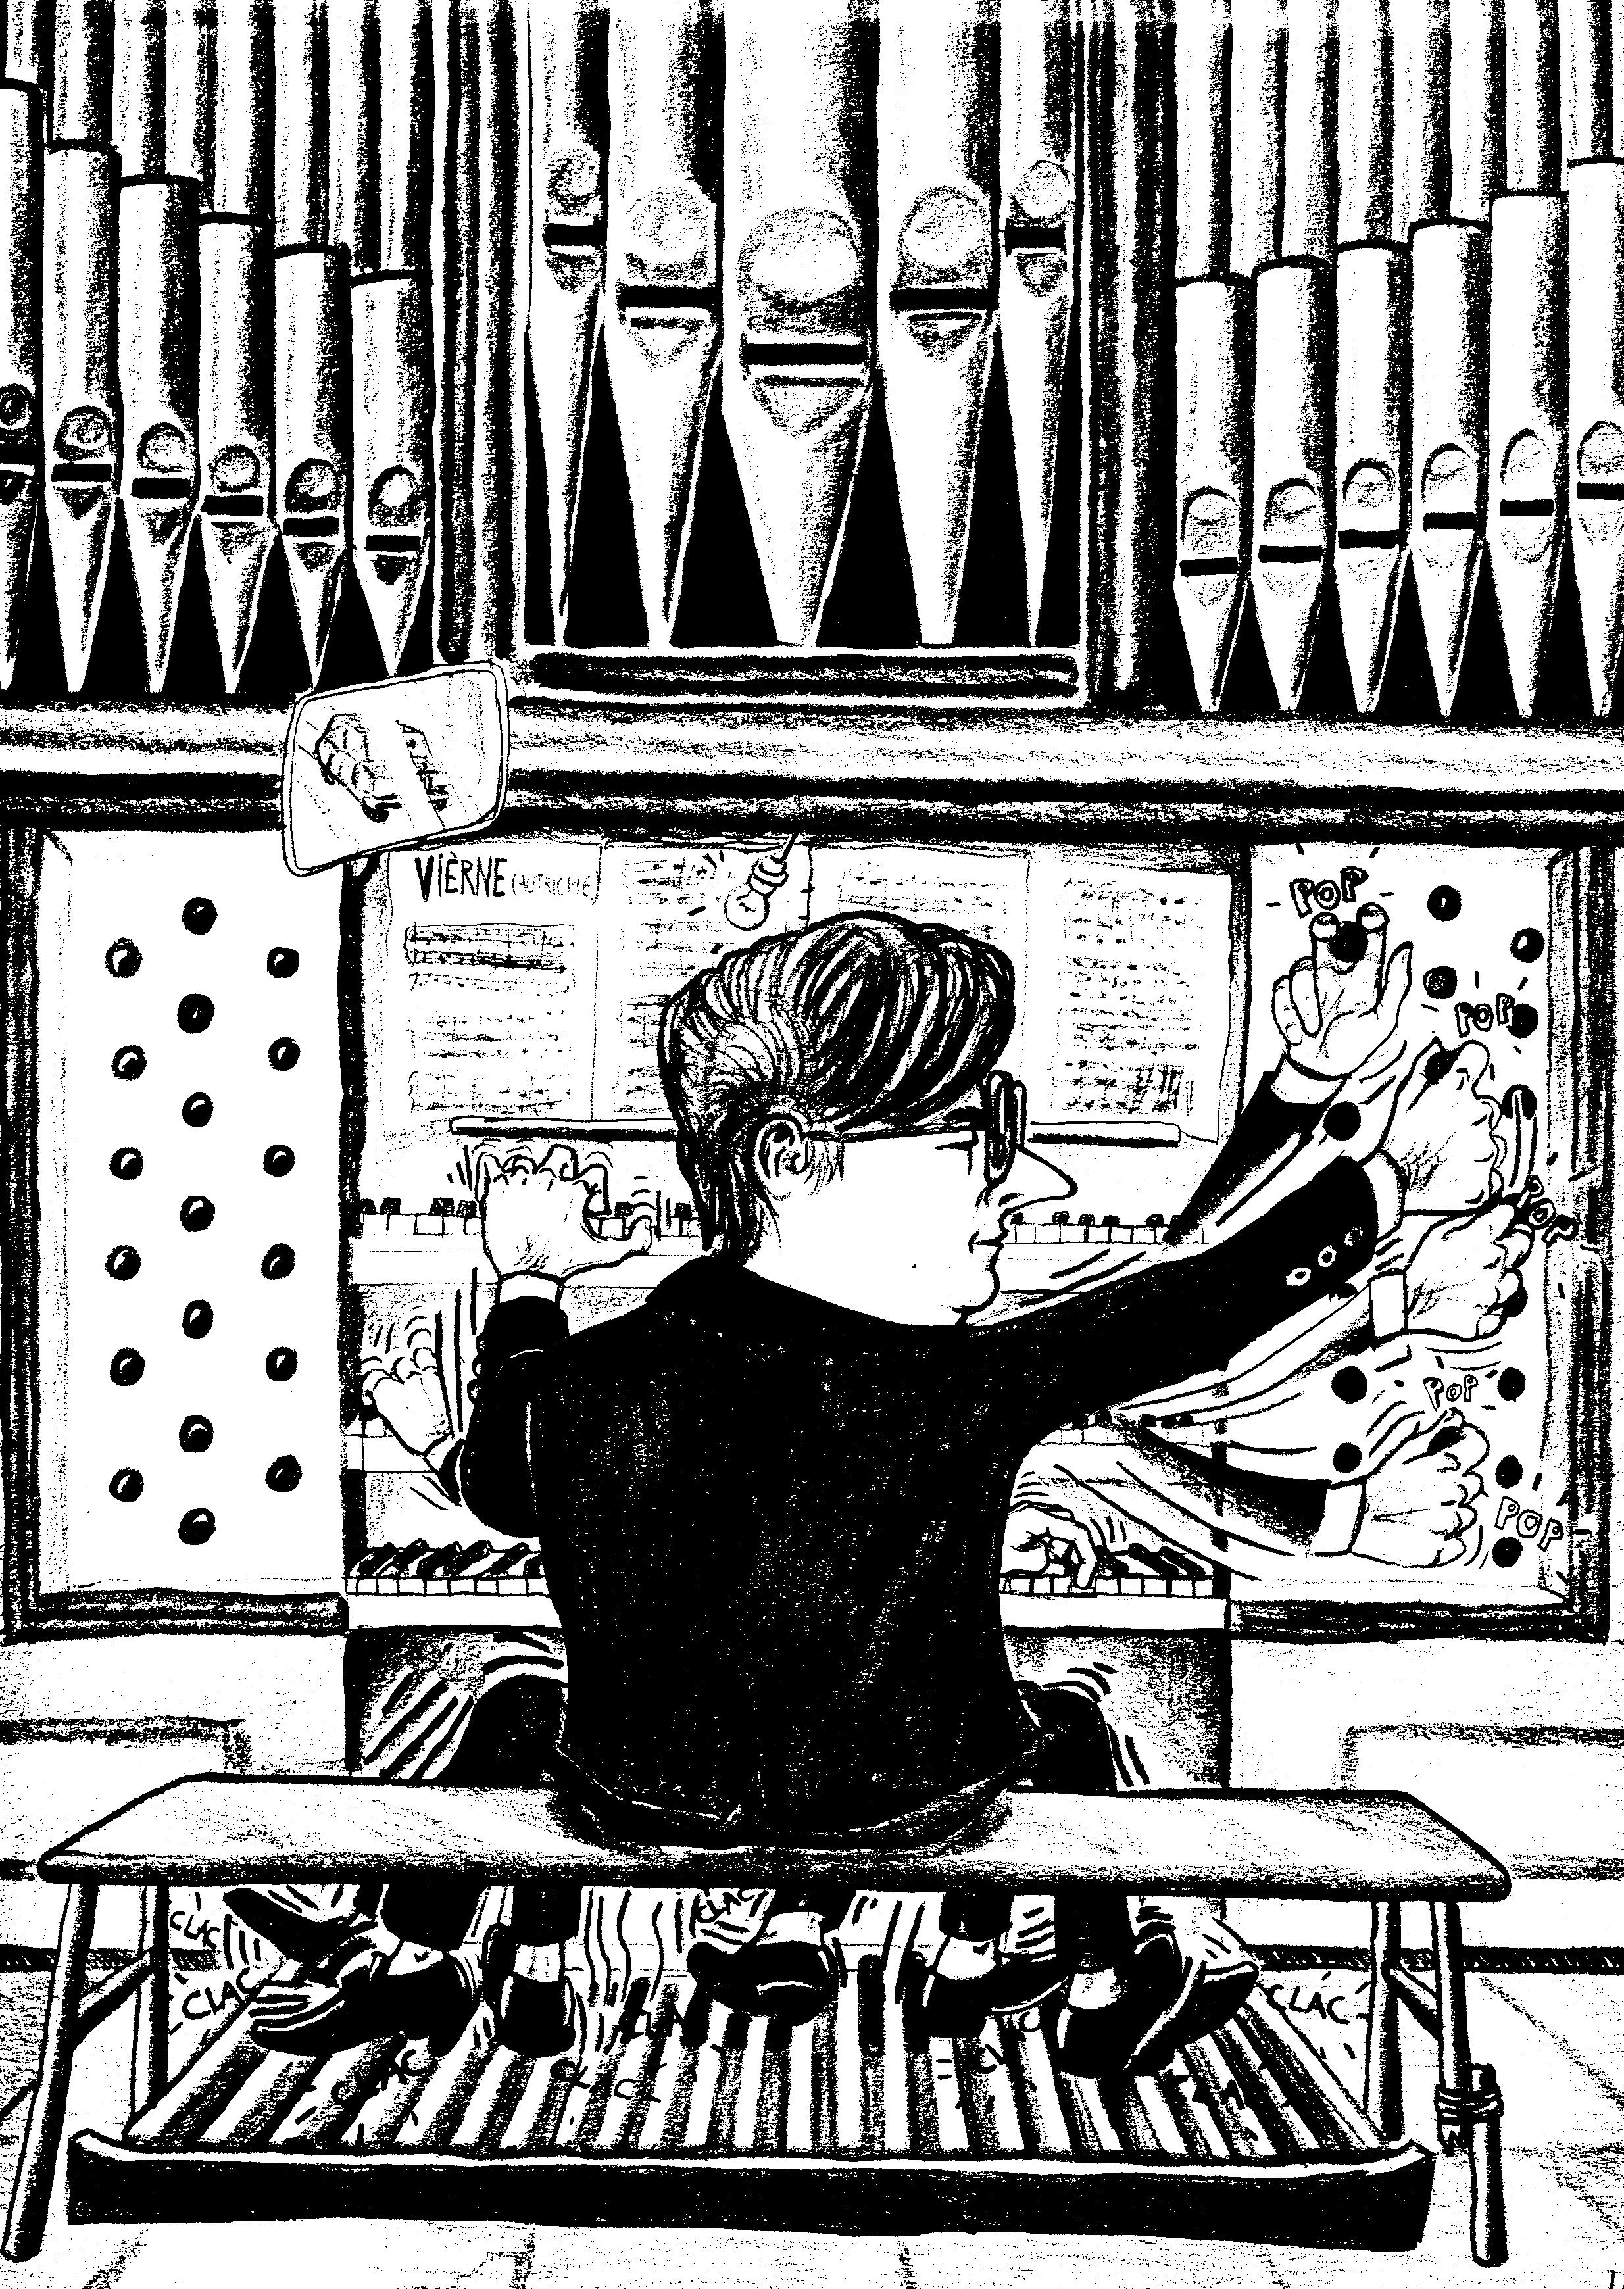 Robert Michel caricature